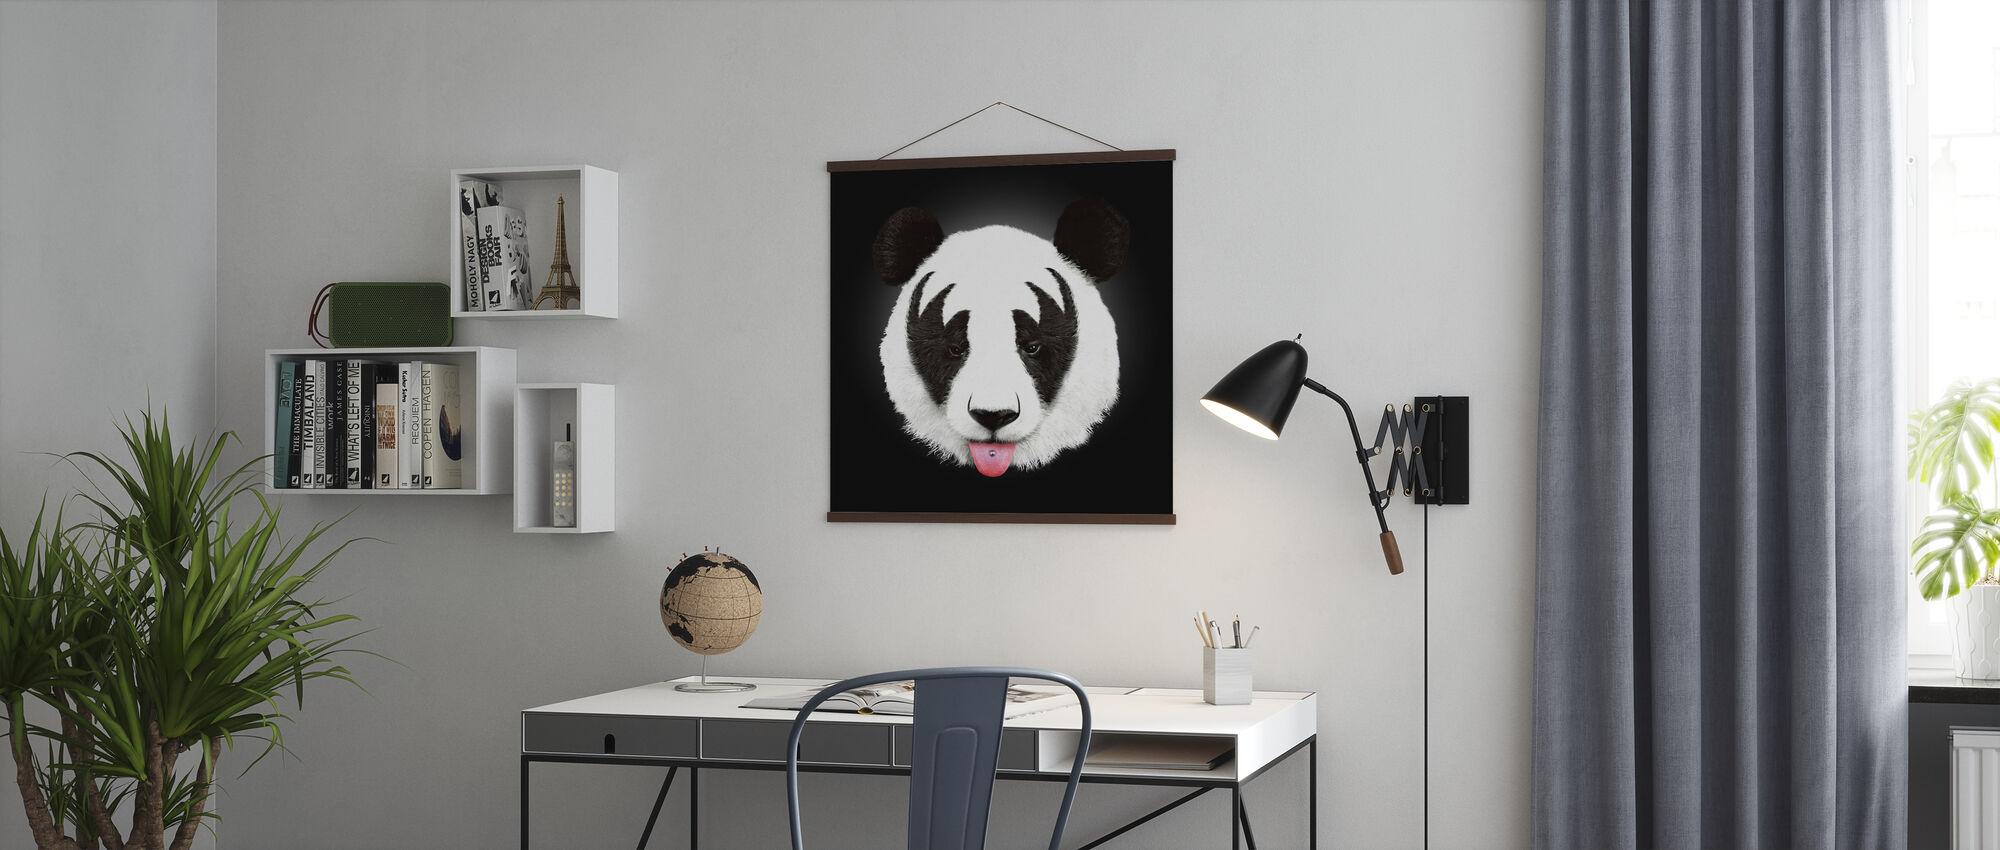 Kiss of a Panda - Poster - Office